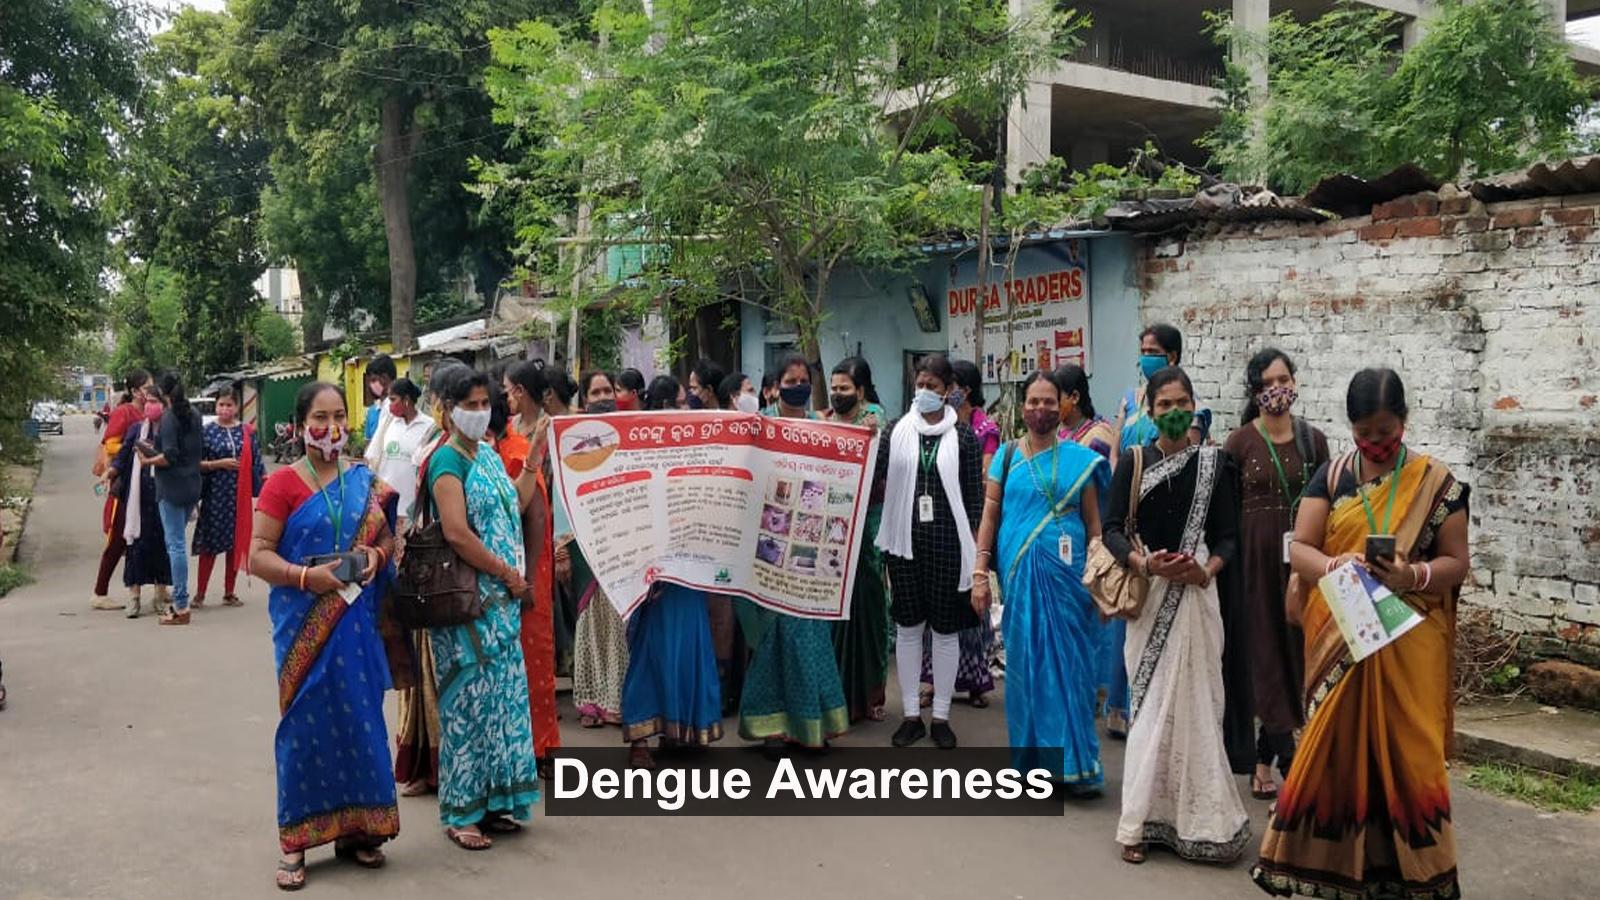 bhubaneswar-bmc-launches-dengue-awareness-drive-in-city